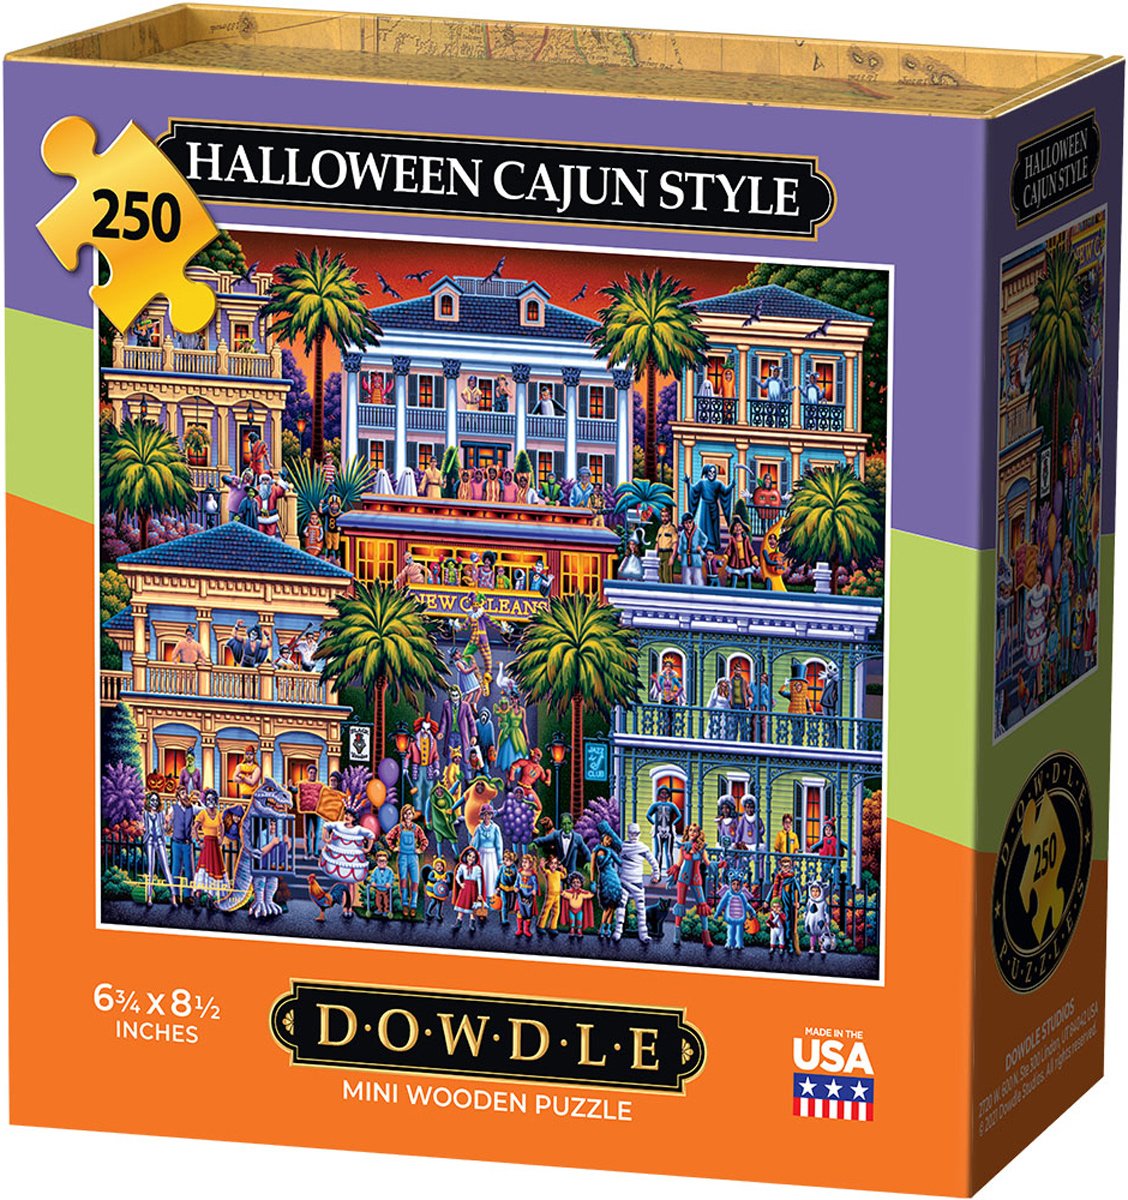 Halloween Cajun Style Halloween Jigsaw Puzzle